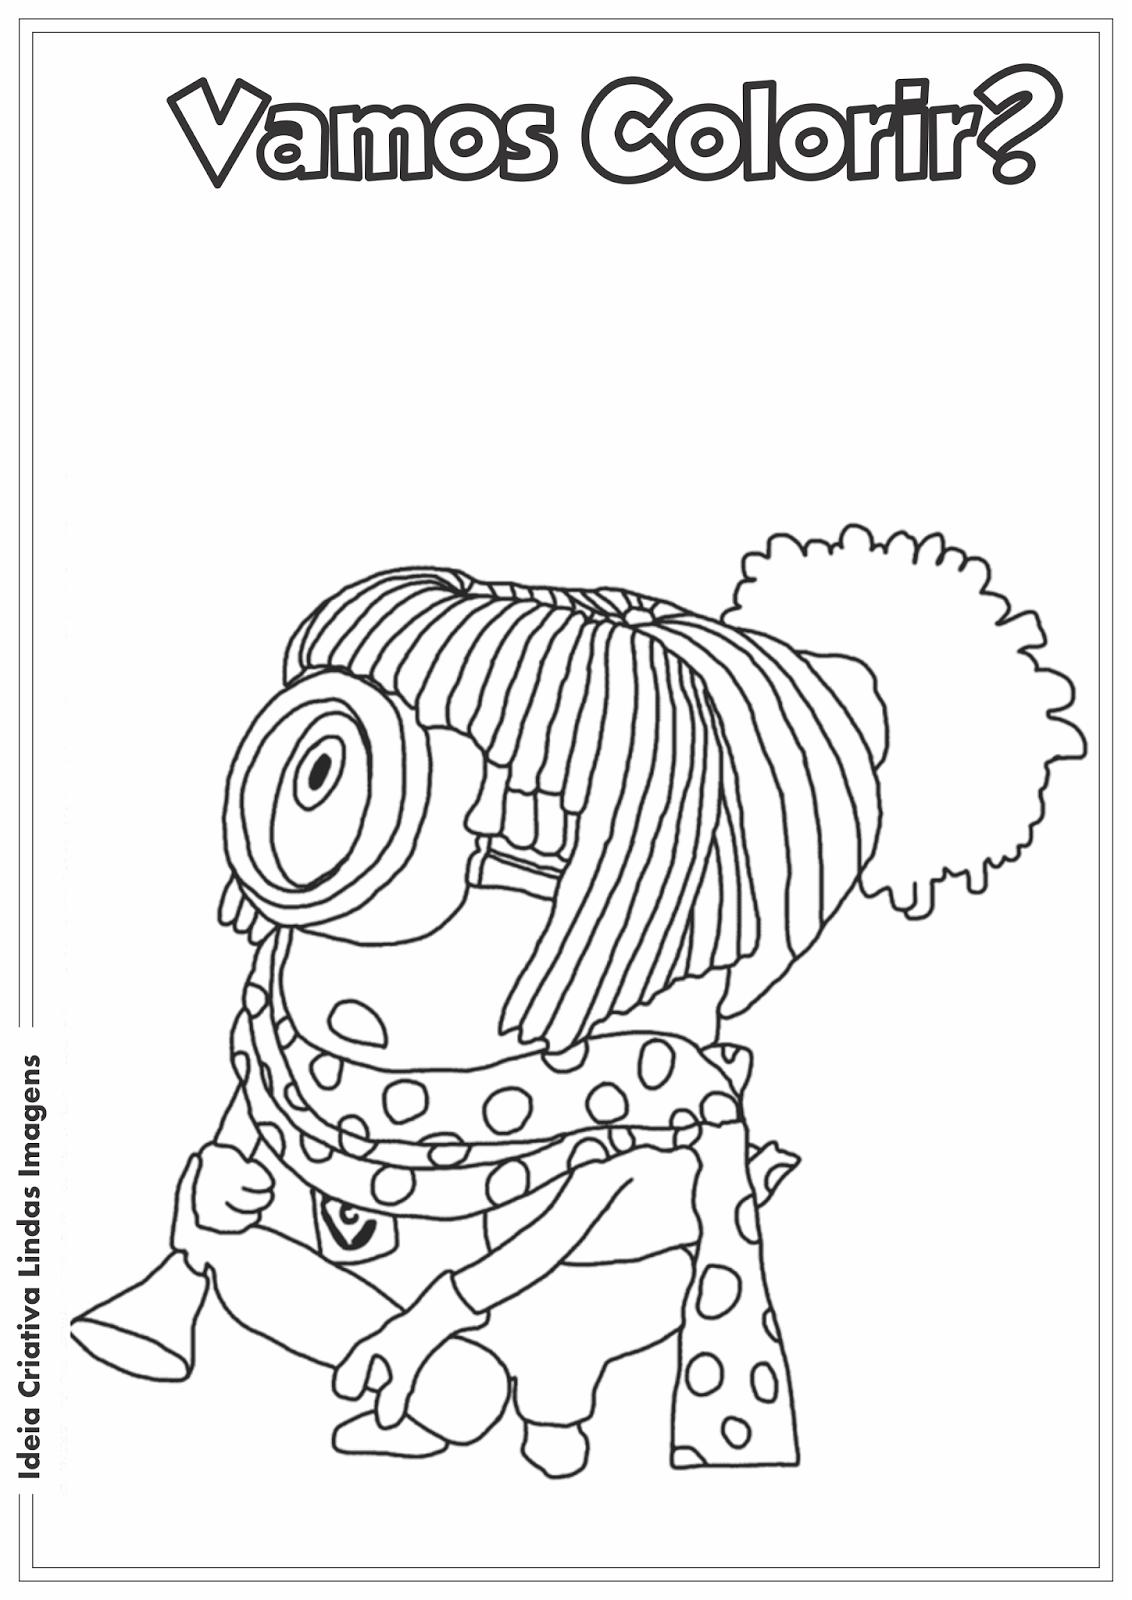 Meu Malvado Favorito 2 - Minion desenho para colorir